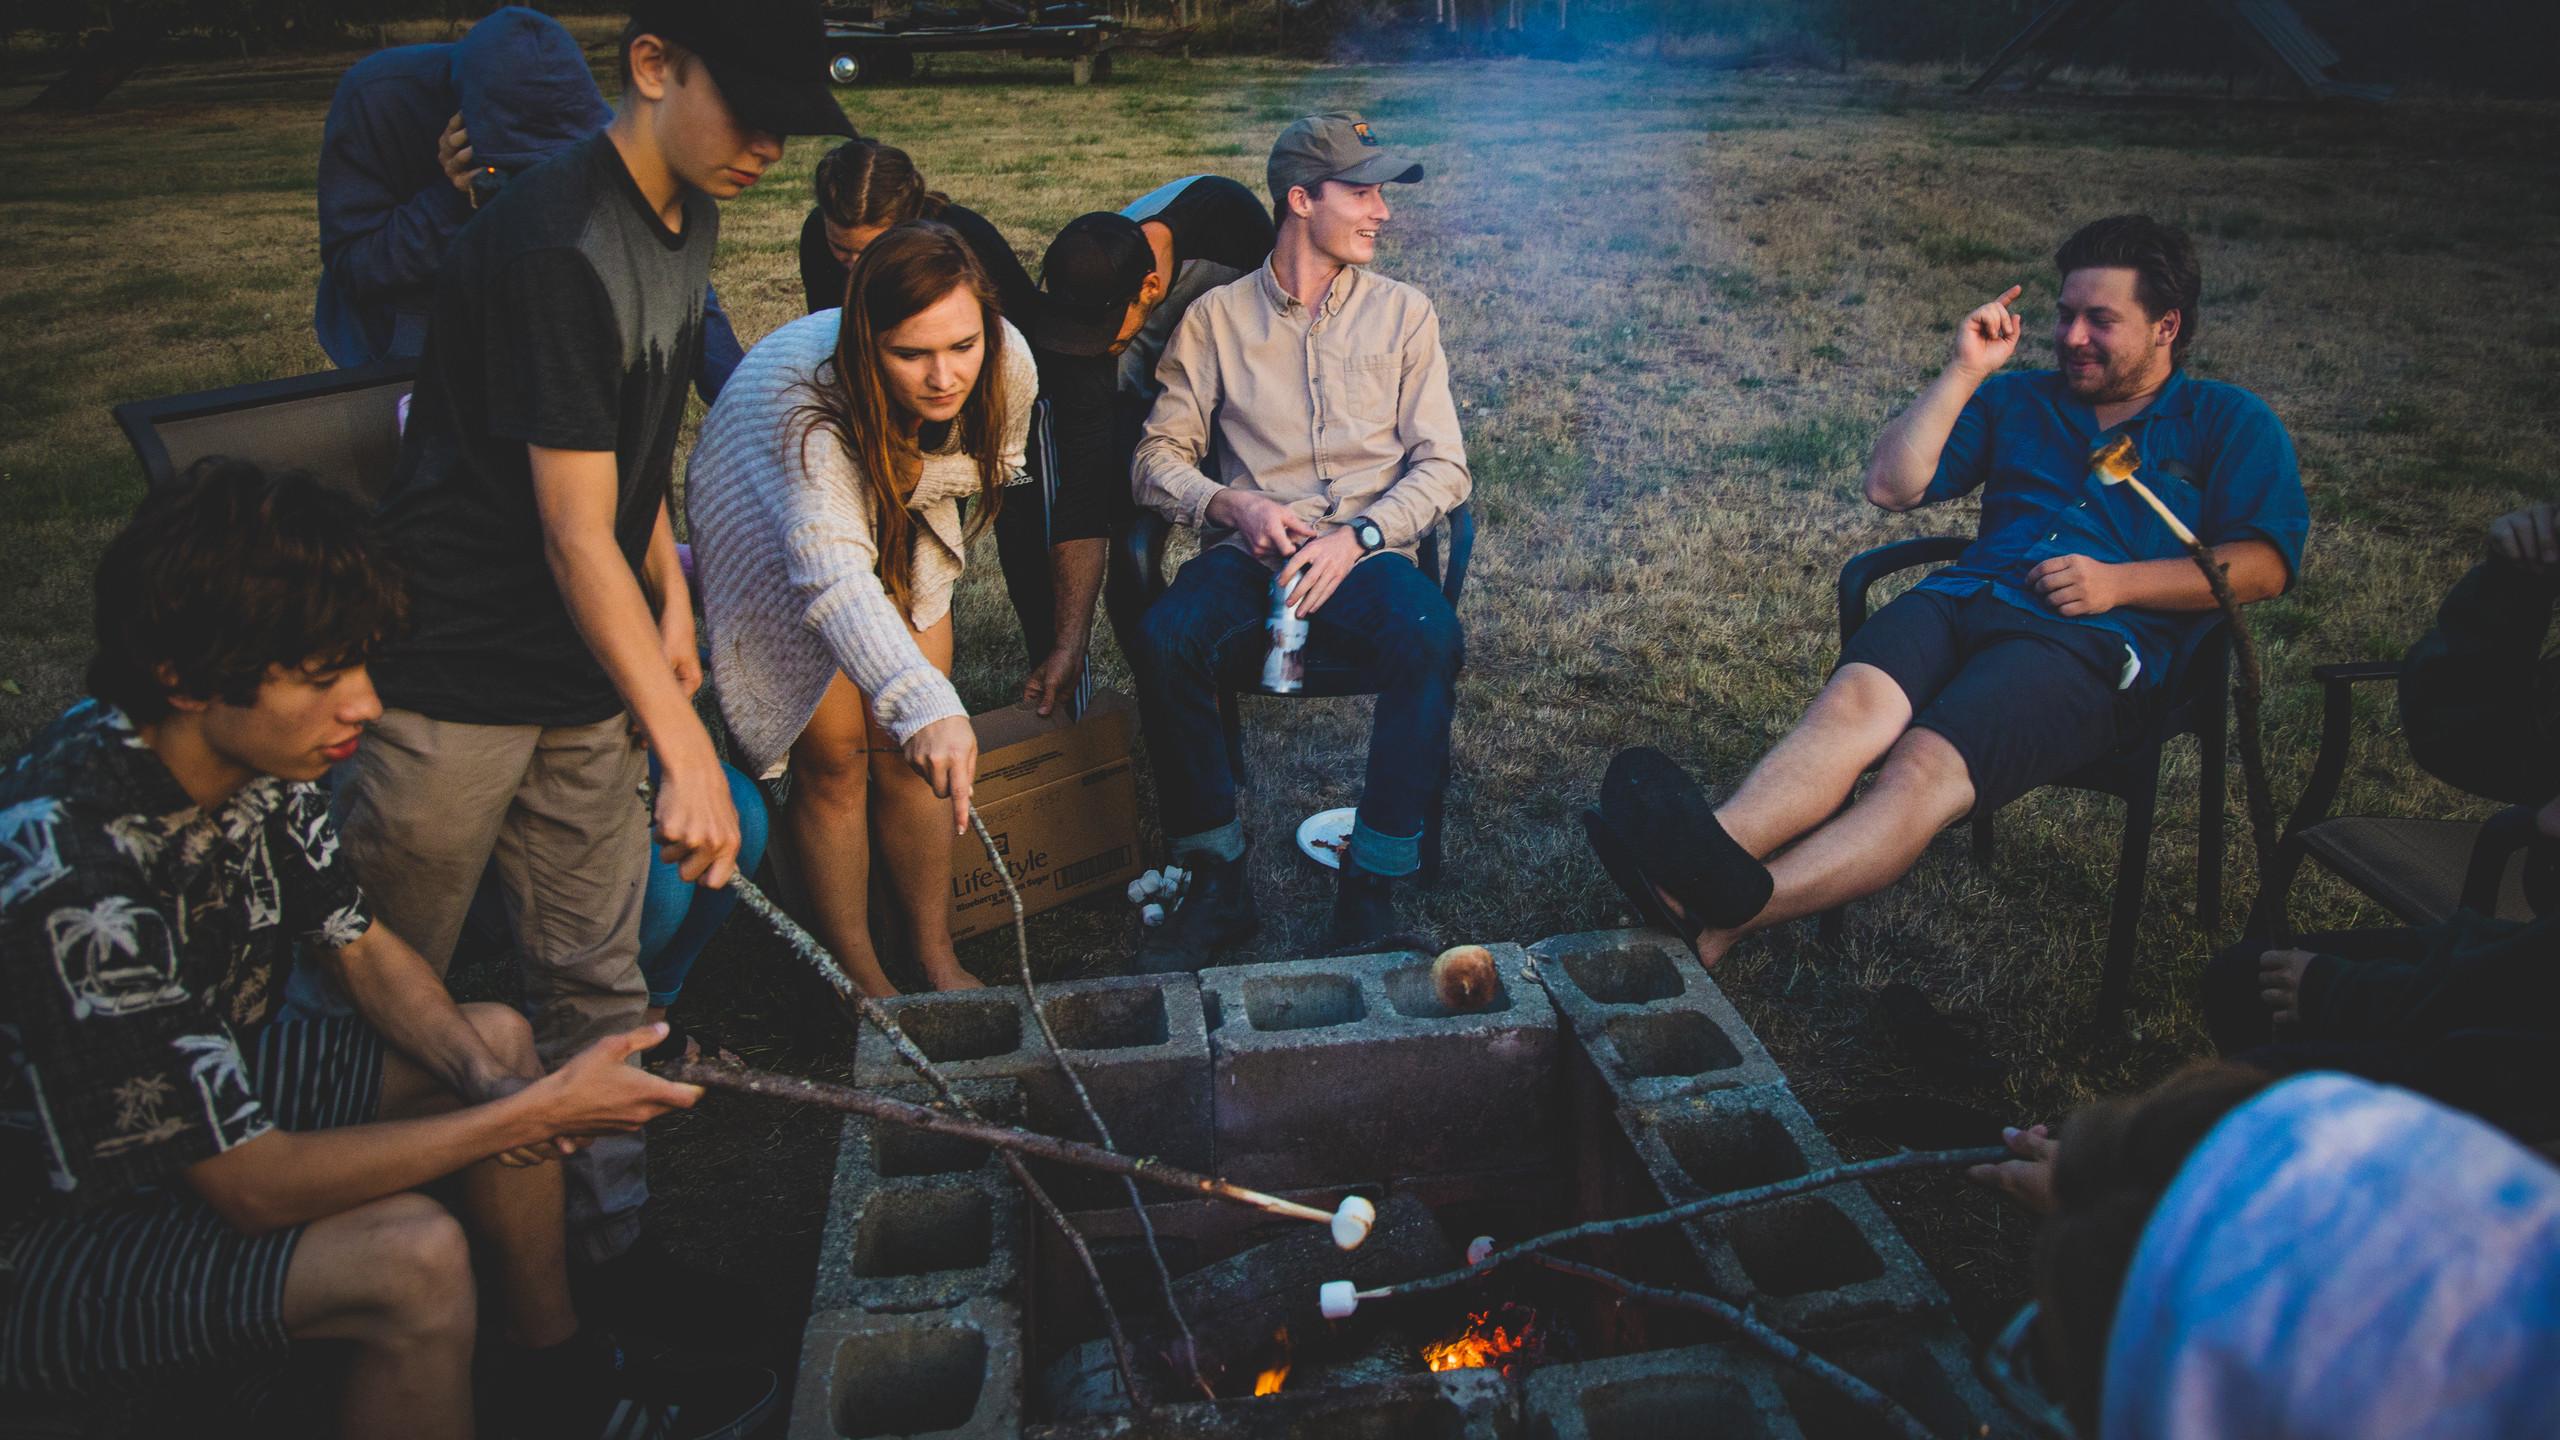 Bonfire Chats